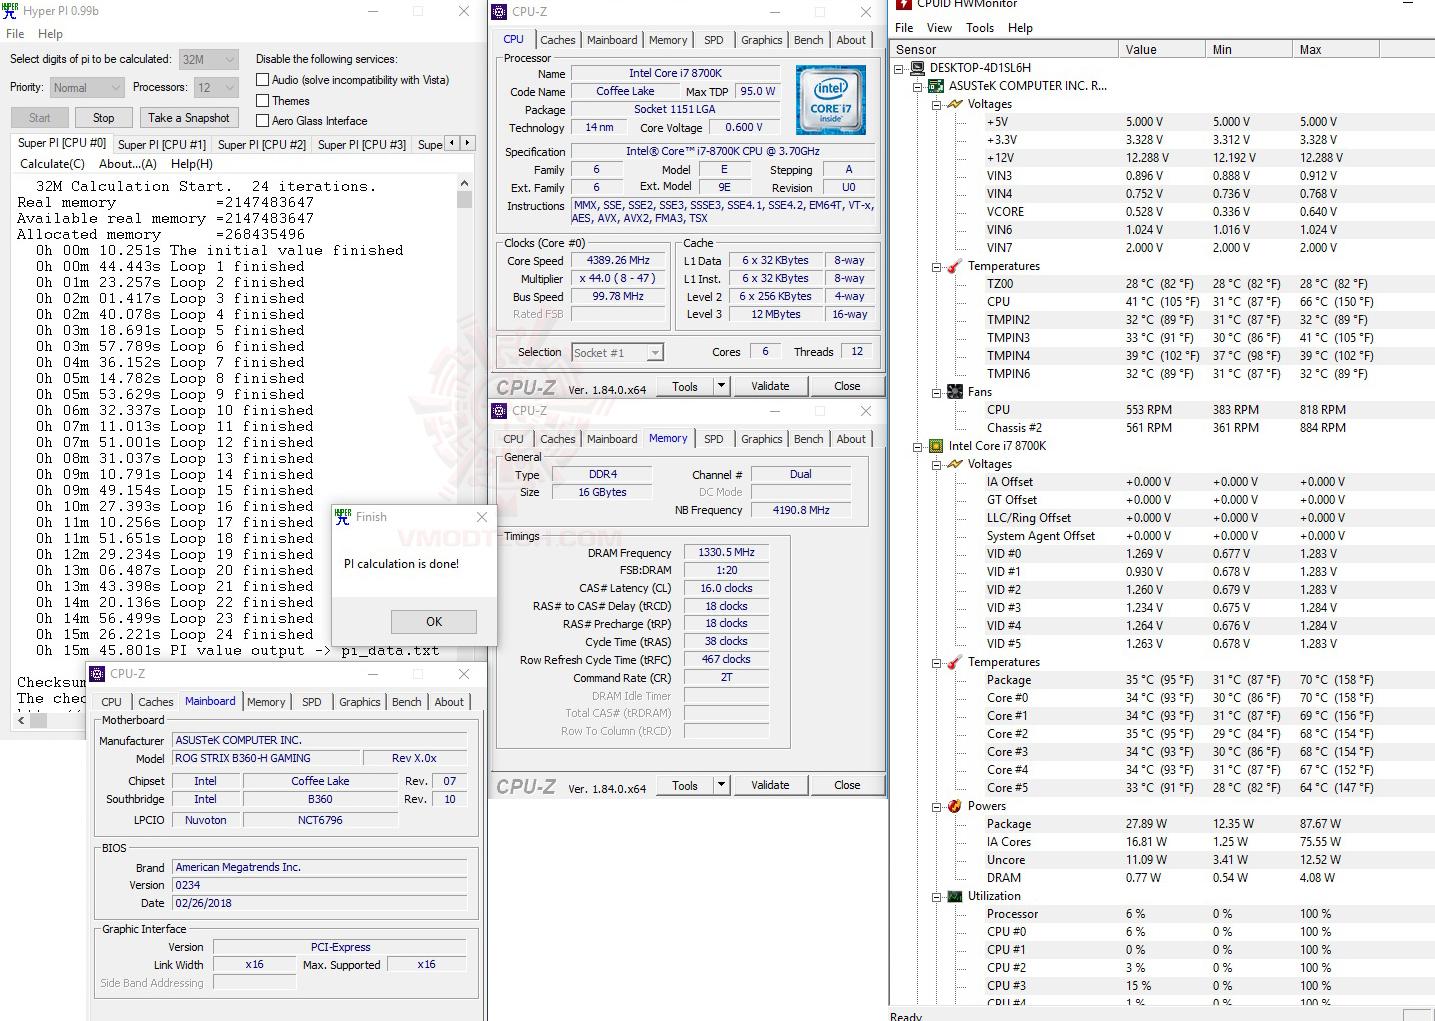 h32 1 ASUS ROG STRIX B360 H GAMING REVIEW